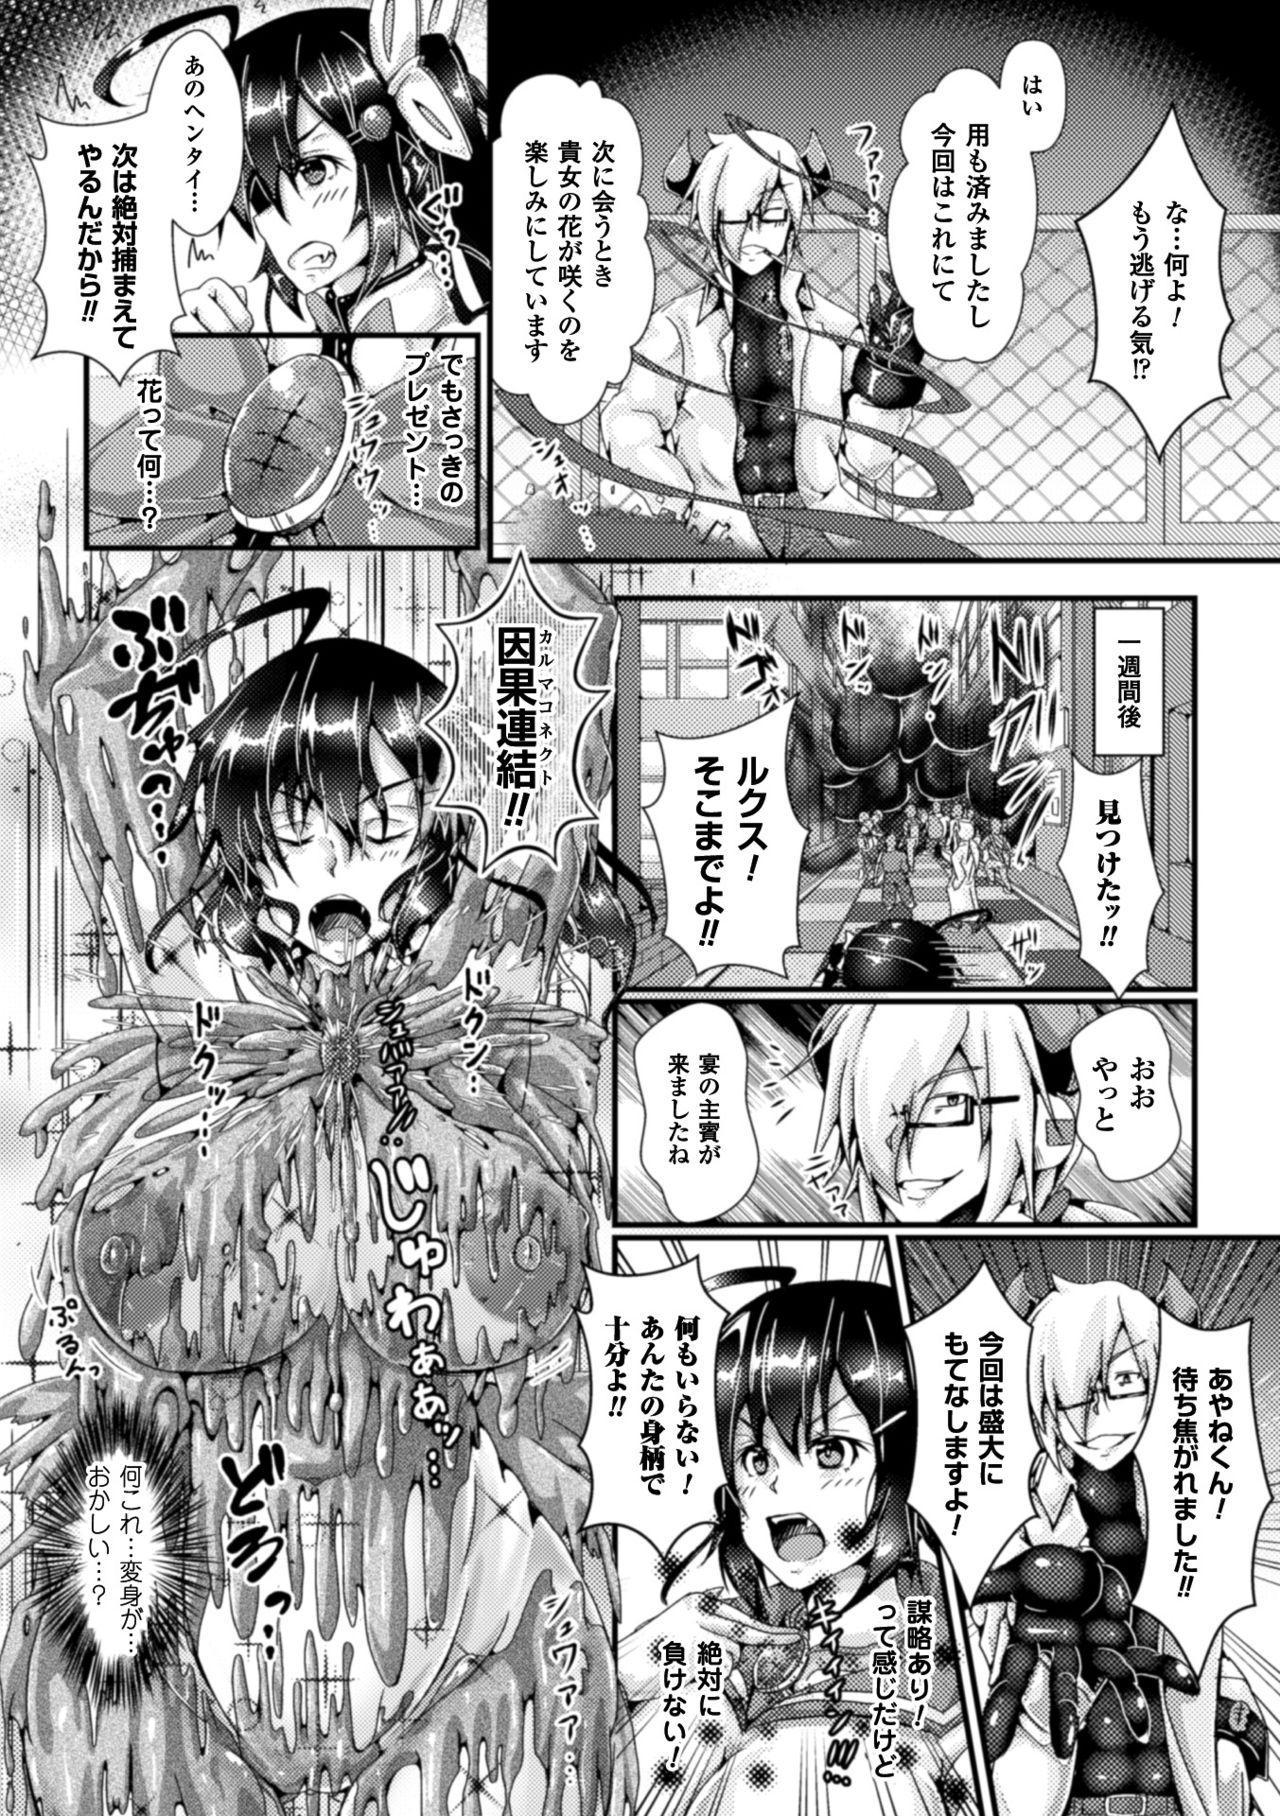 2D Comic Magazine Shokushu Yoroi ni Zenshin o Okasare Mugen Zecchou! Vol. 5 46